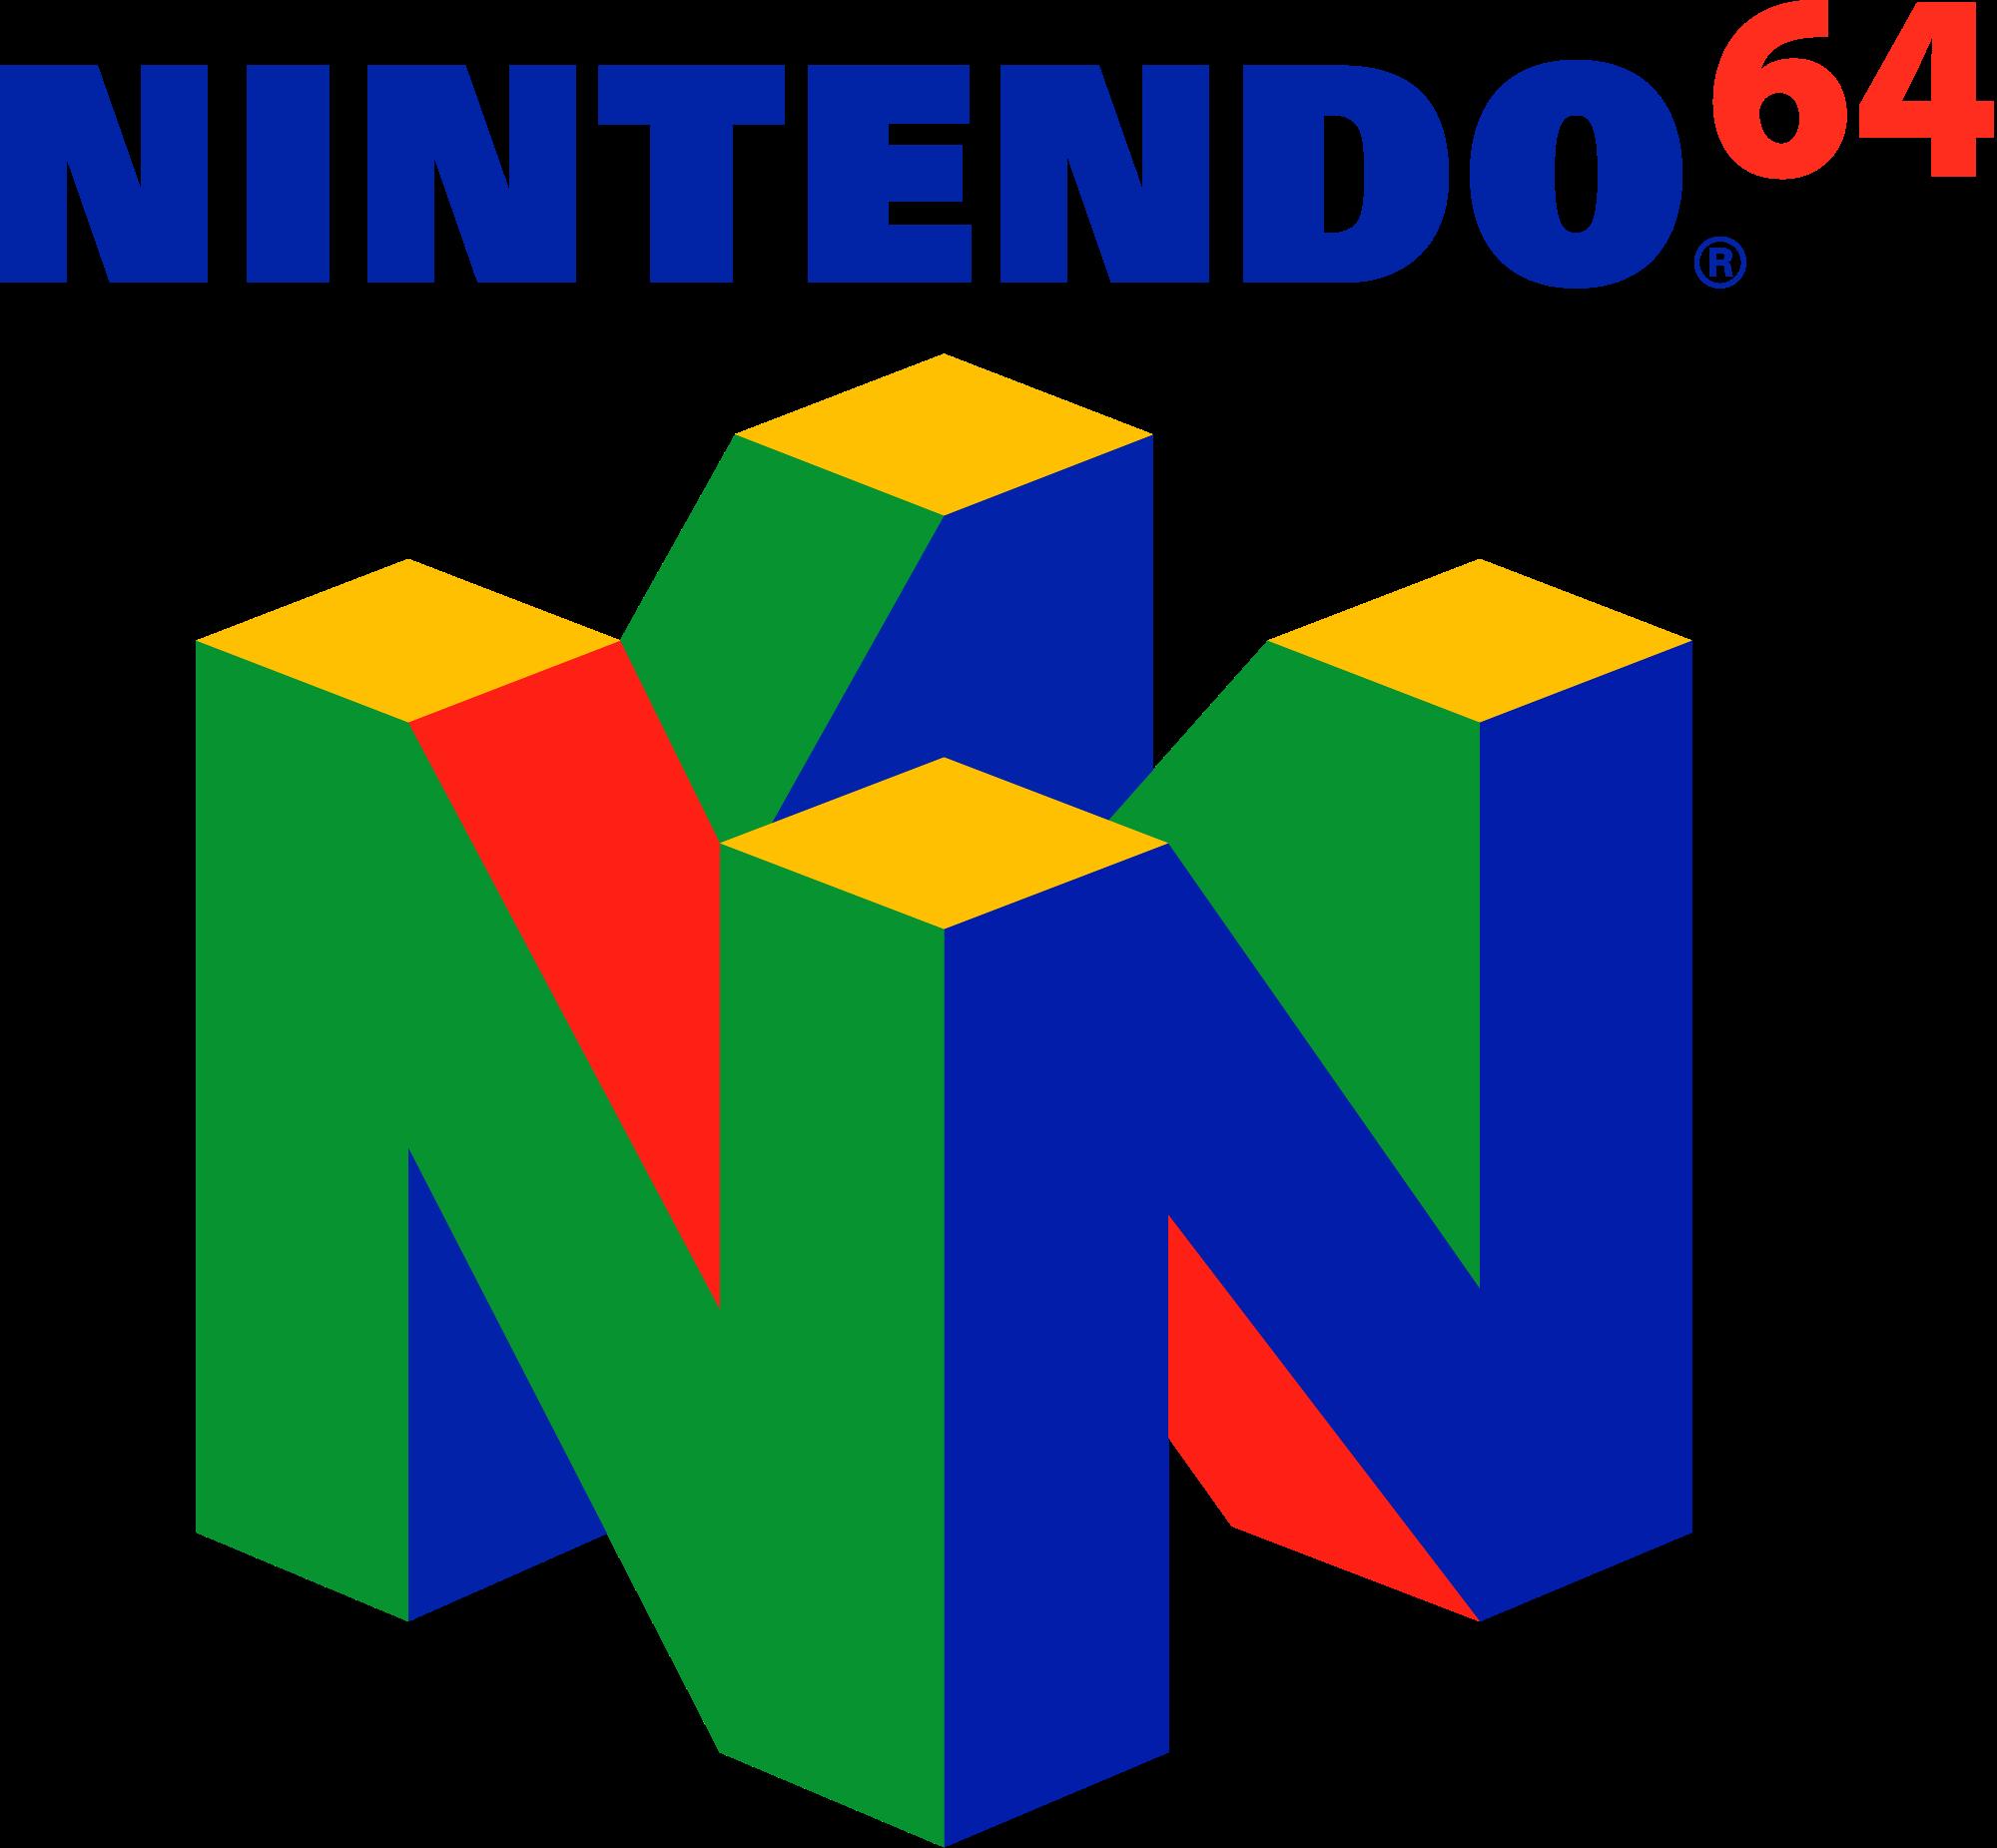 Nintendo 64 Nintendo Logo Nintendo 64 Nintendo 64 Games